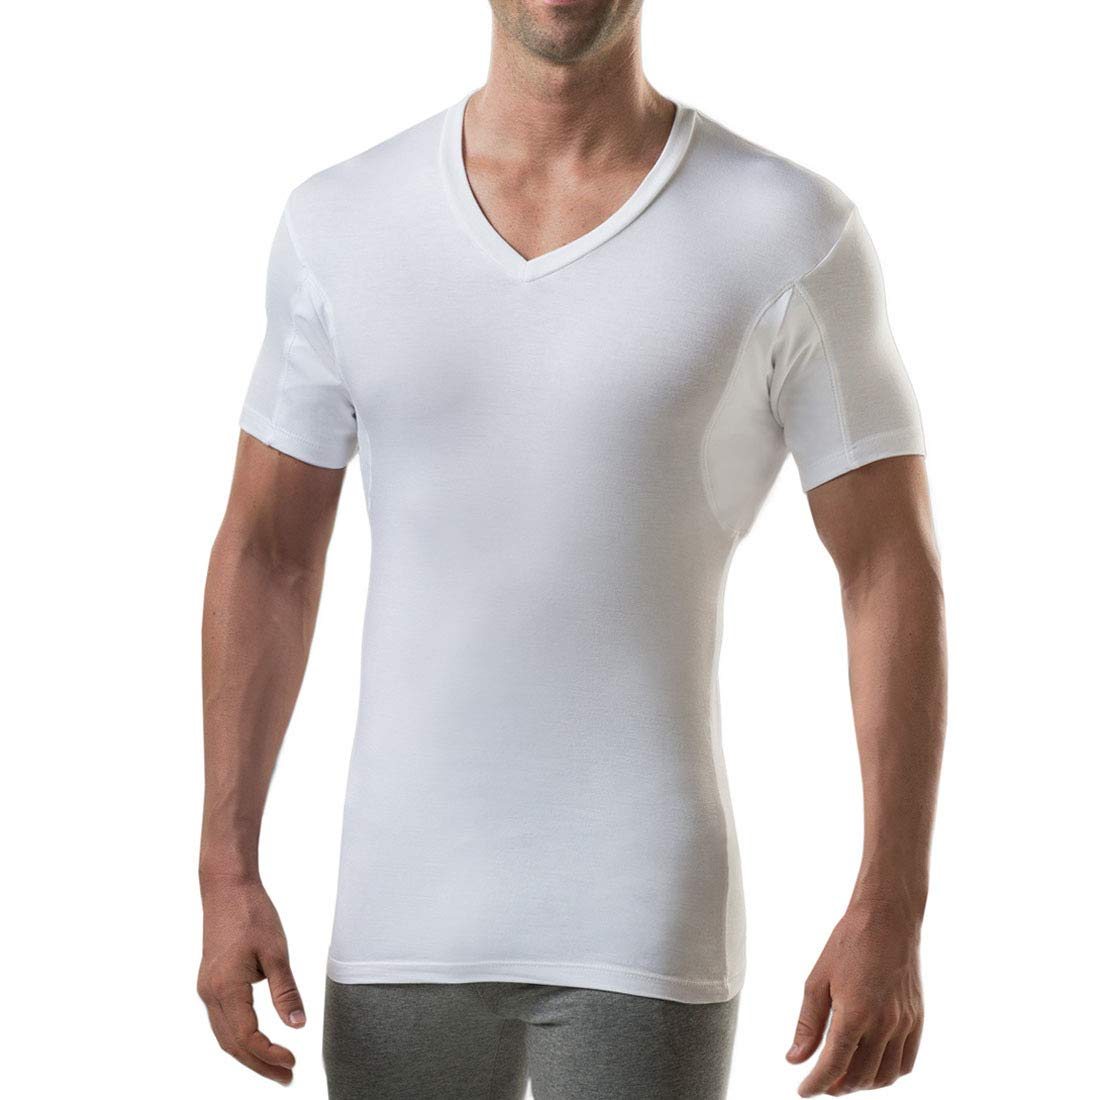 Sweatproof Undershirt for Men with Underarm Sweat Pads (Slim Fit, V-Neck) (Medium (2-Pack), White)